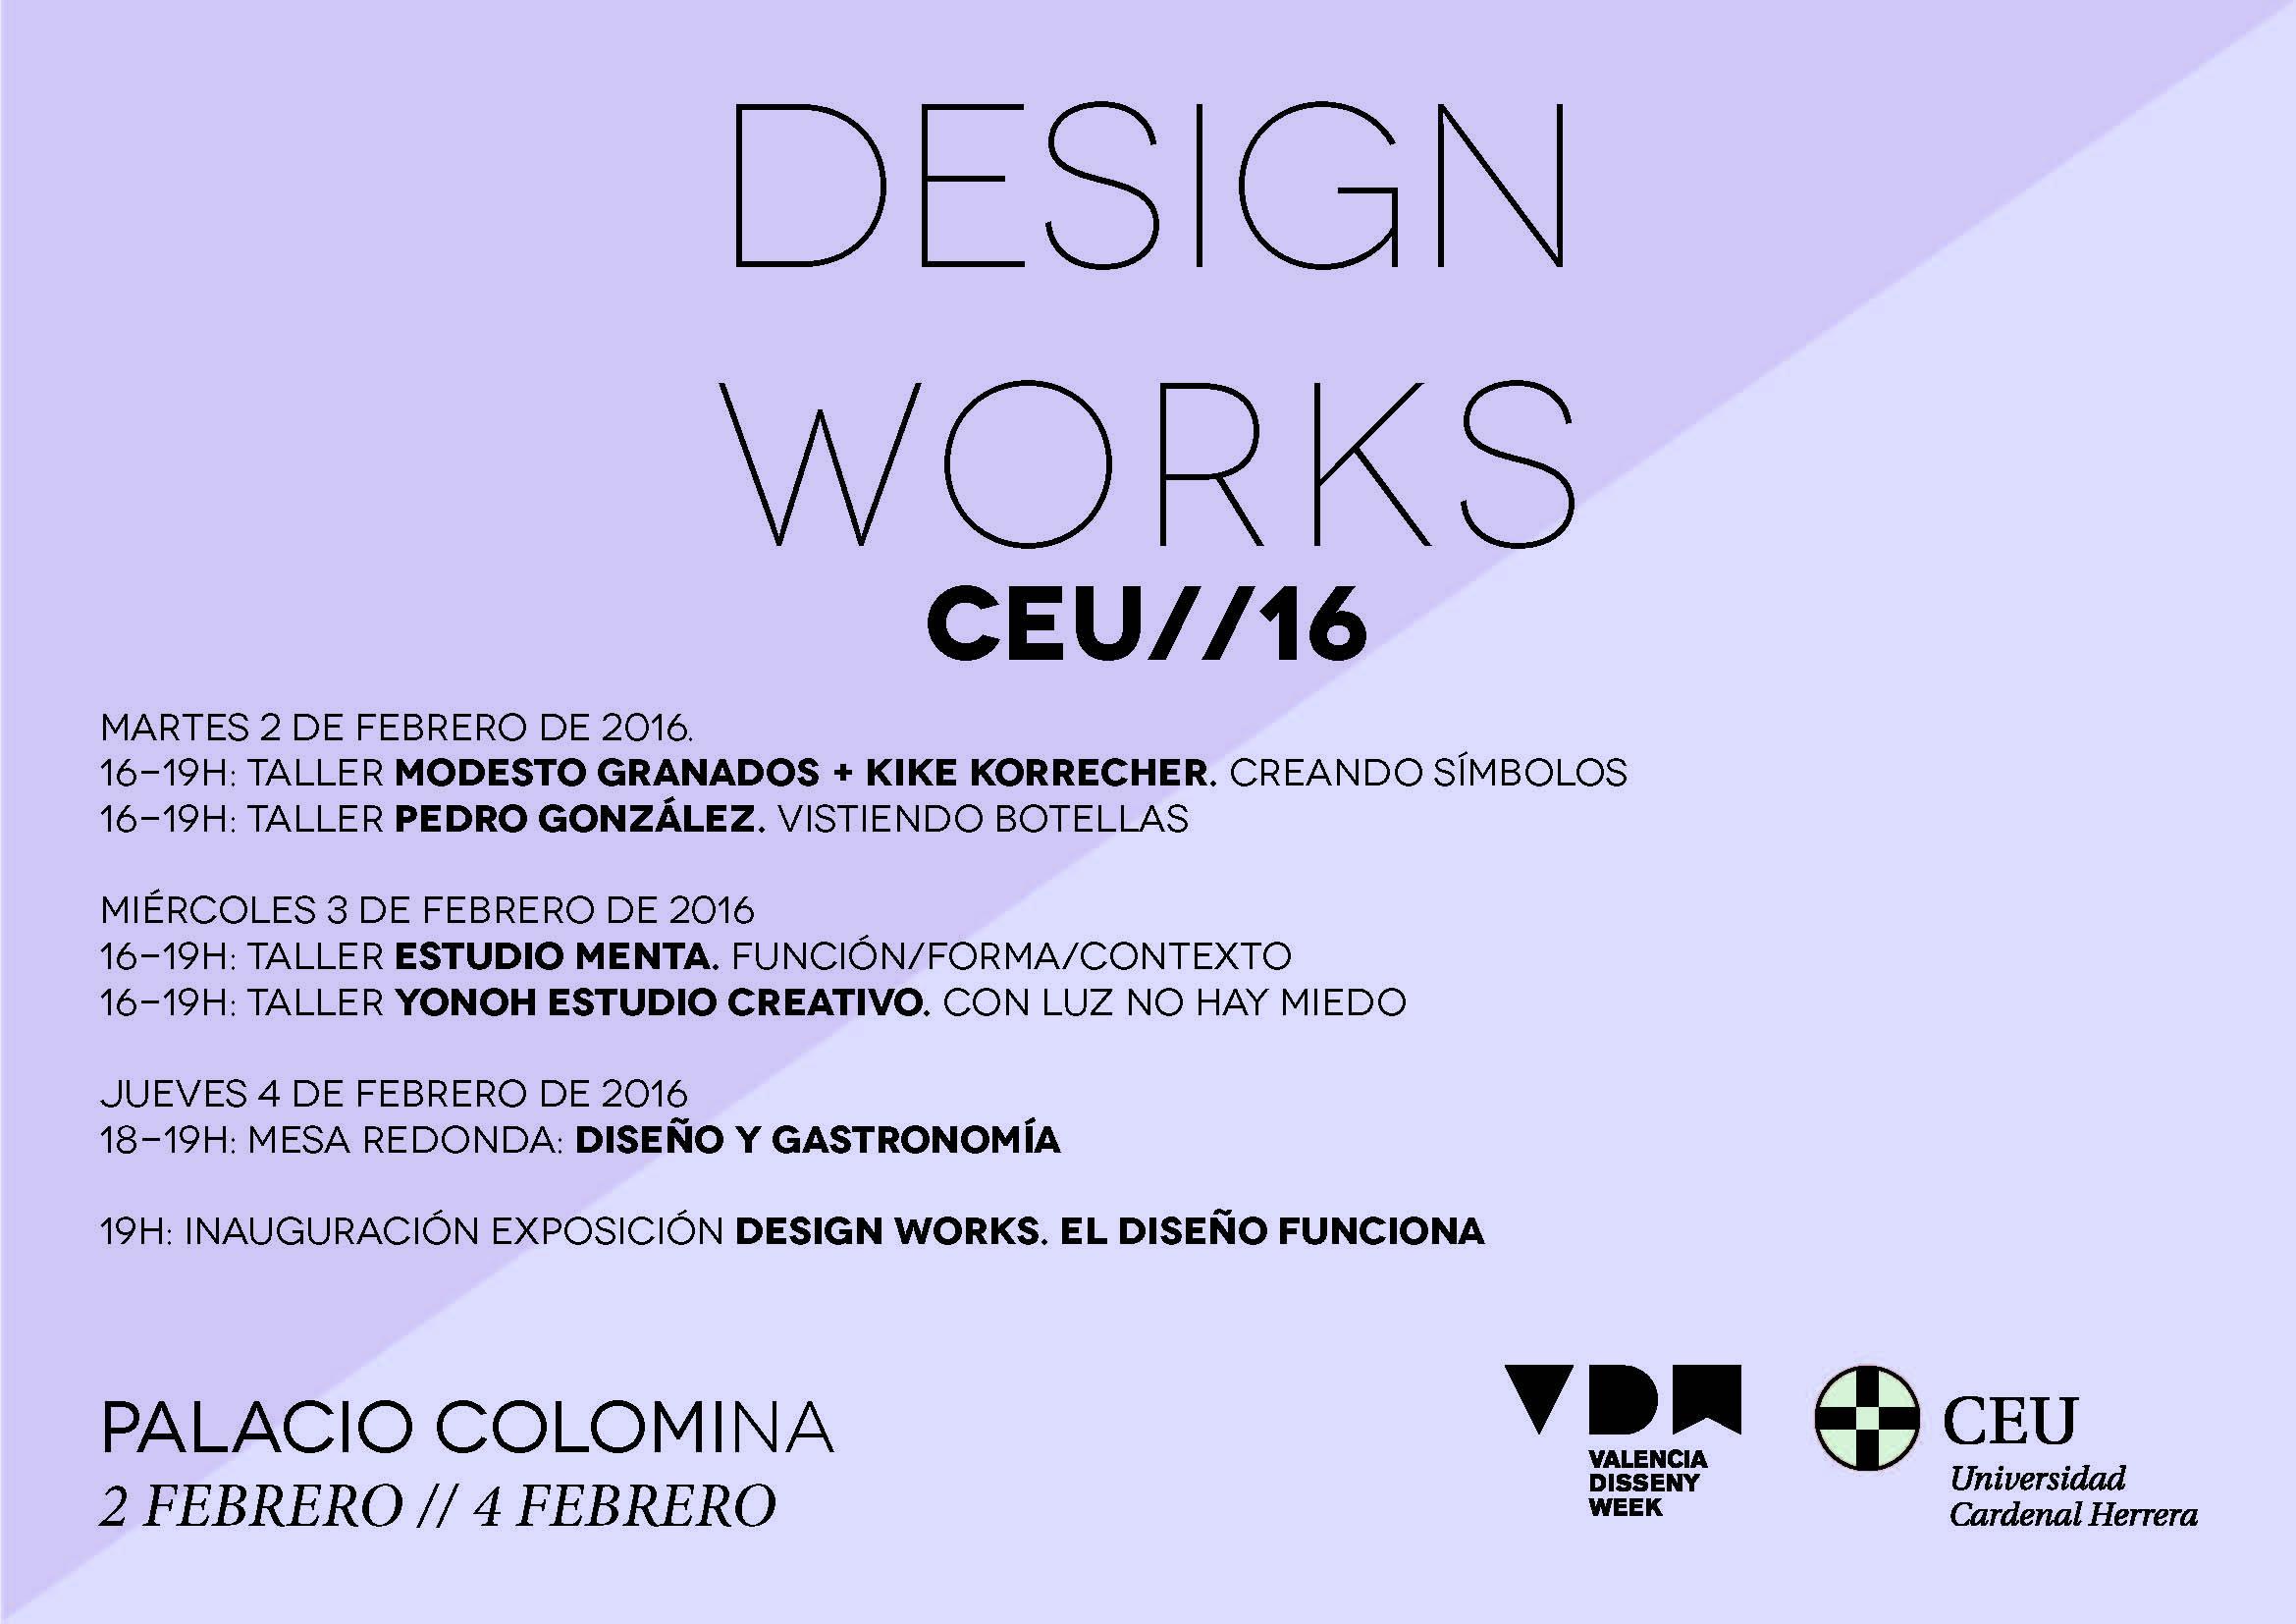 vdw-cartel-design-works-2016-ceu-uch